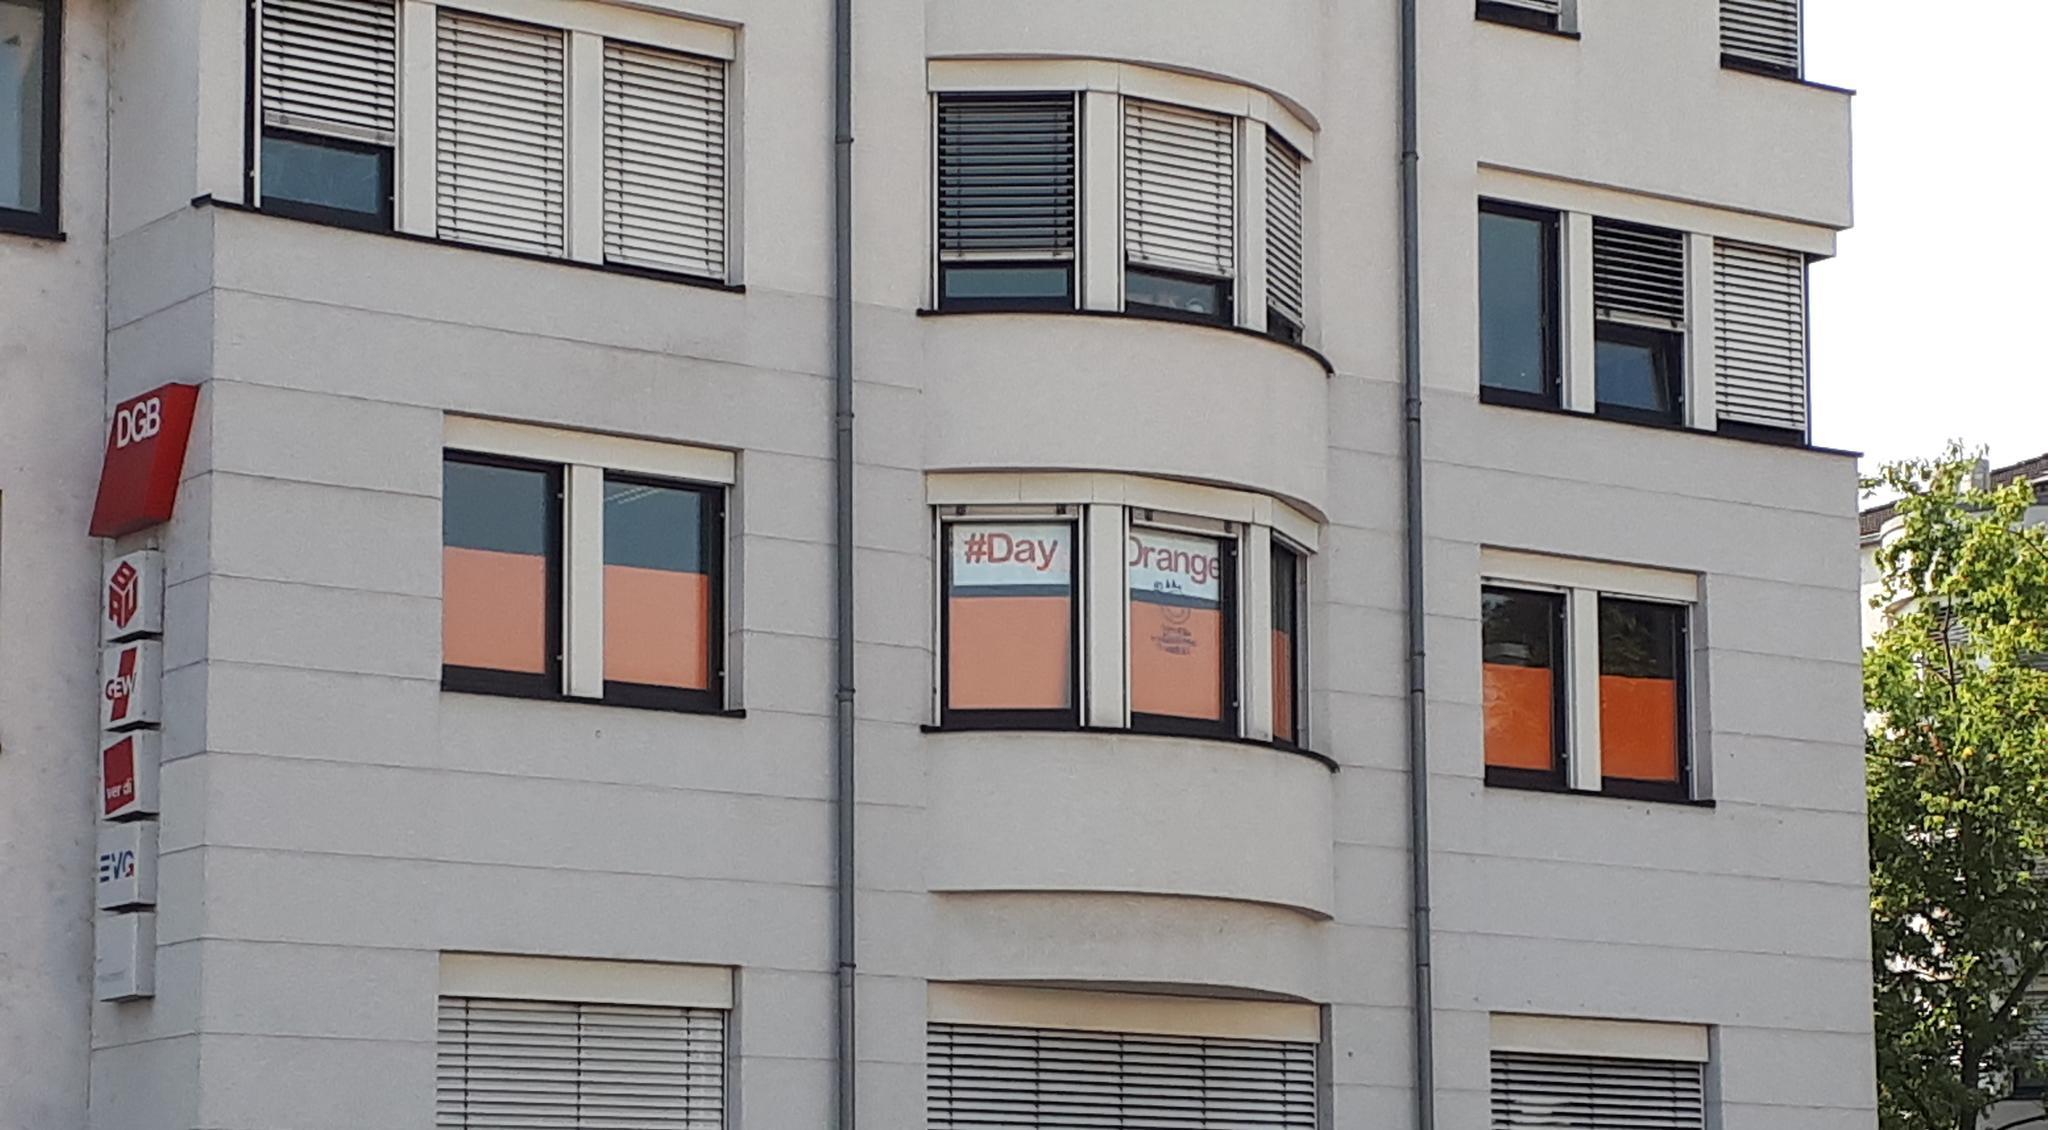 Pressebild DGB-Haus Bonn